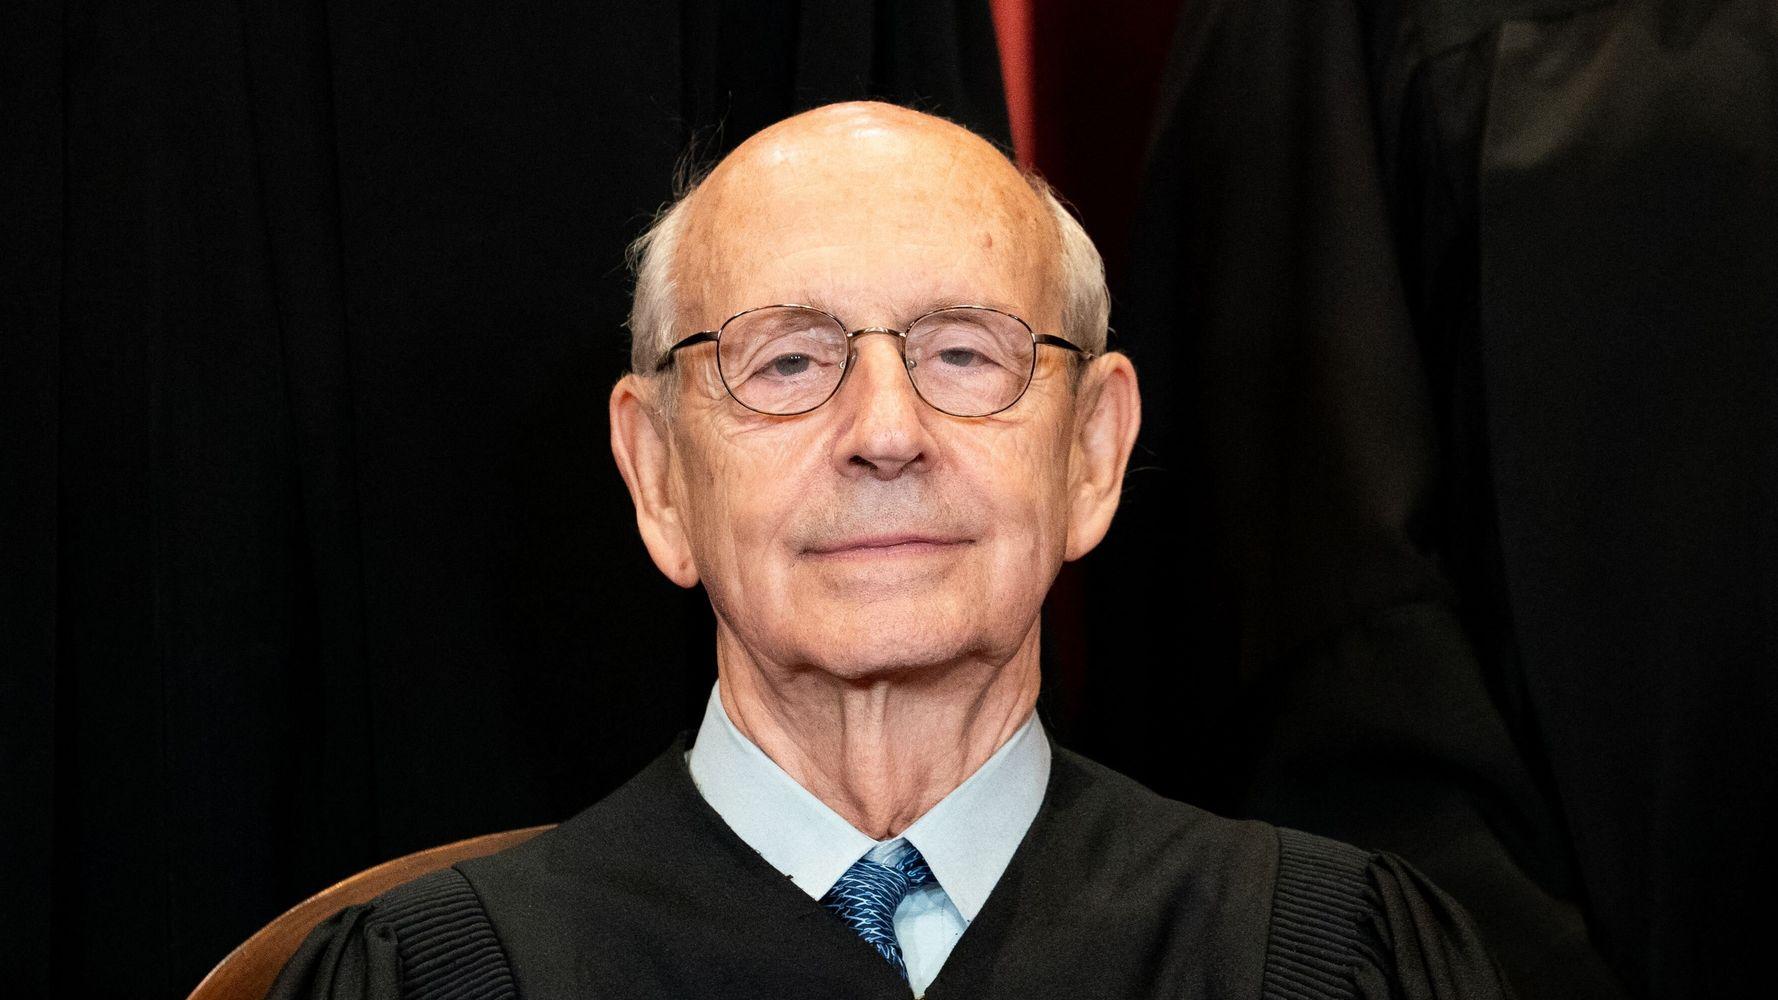 13 Progressive Groups Urge Supreme Court Justice Stephen Breyer To Retire